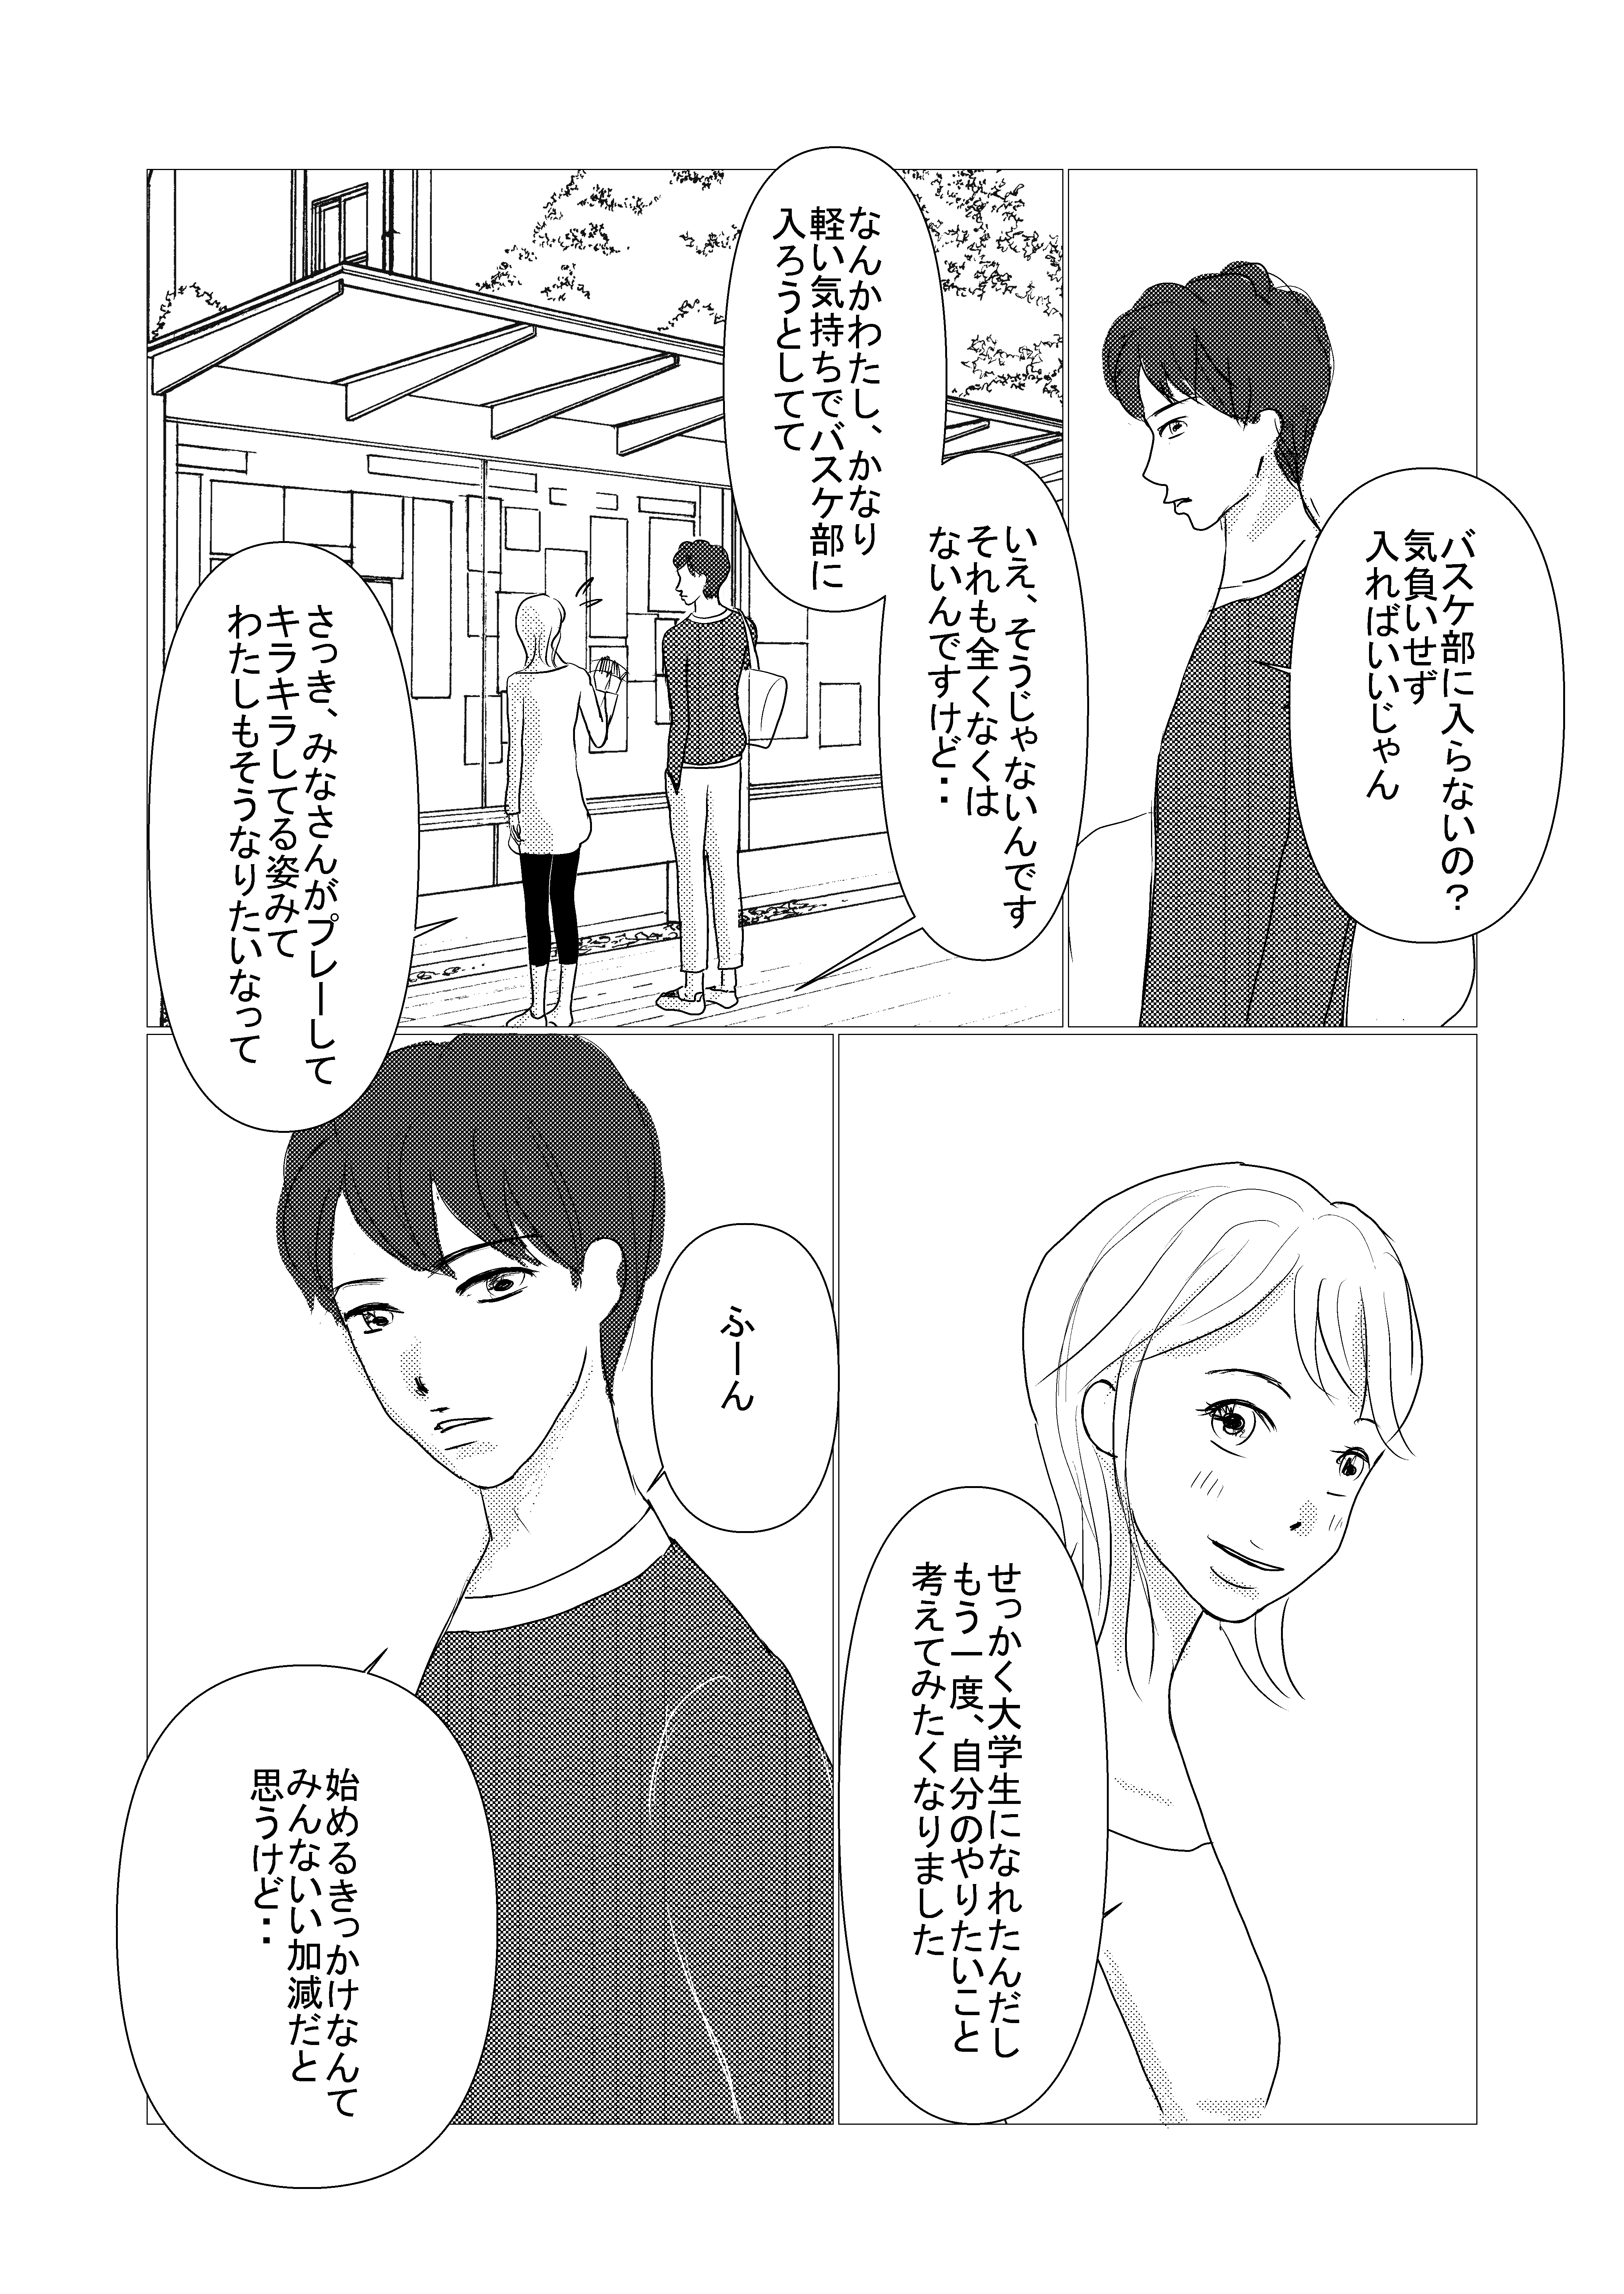 恋愛漫画/大学生/社会人/shoujyo manga/米加夢/21ページ